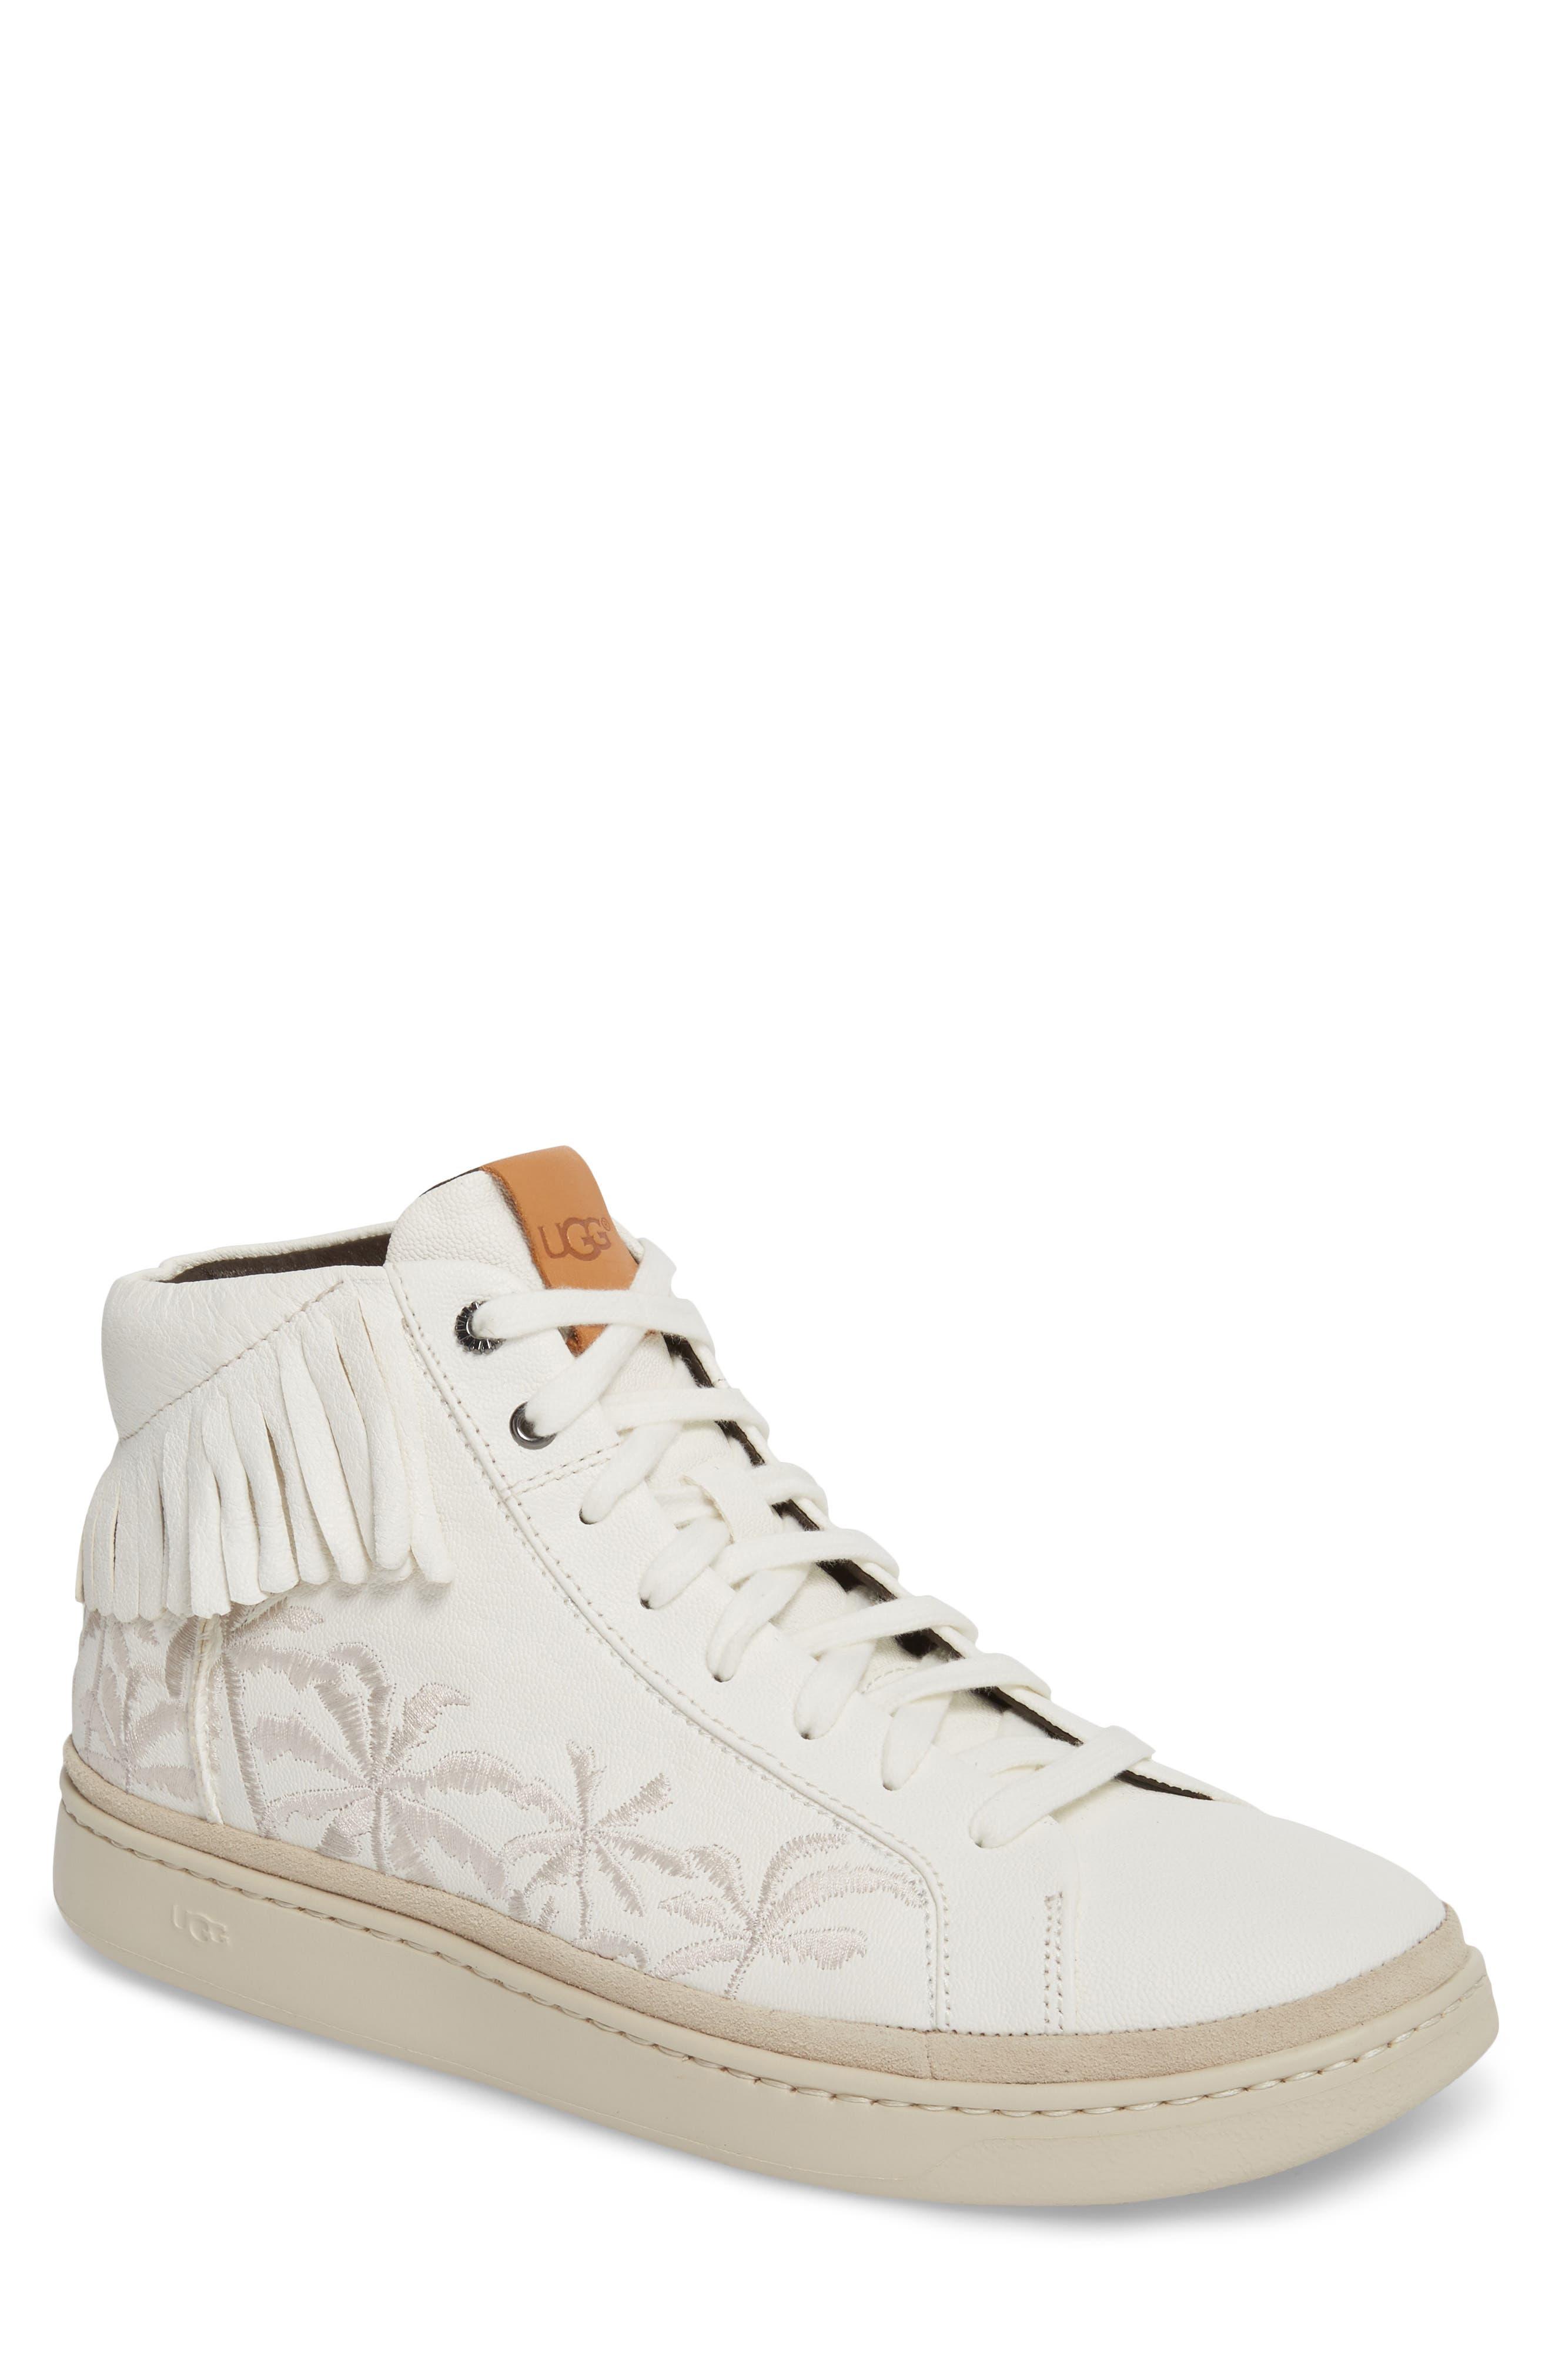 Cali Fringe High Top Sneaker,                             Main thumbnail 1, color,                             White Leather